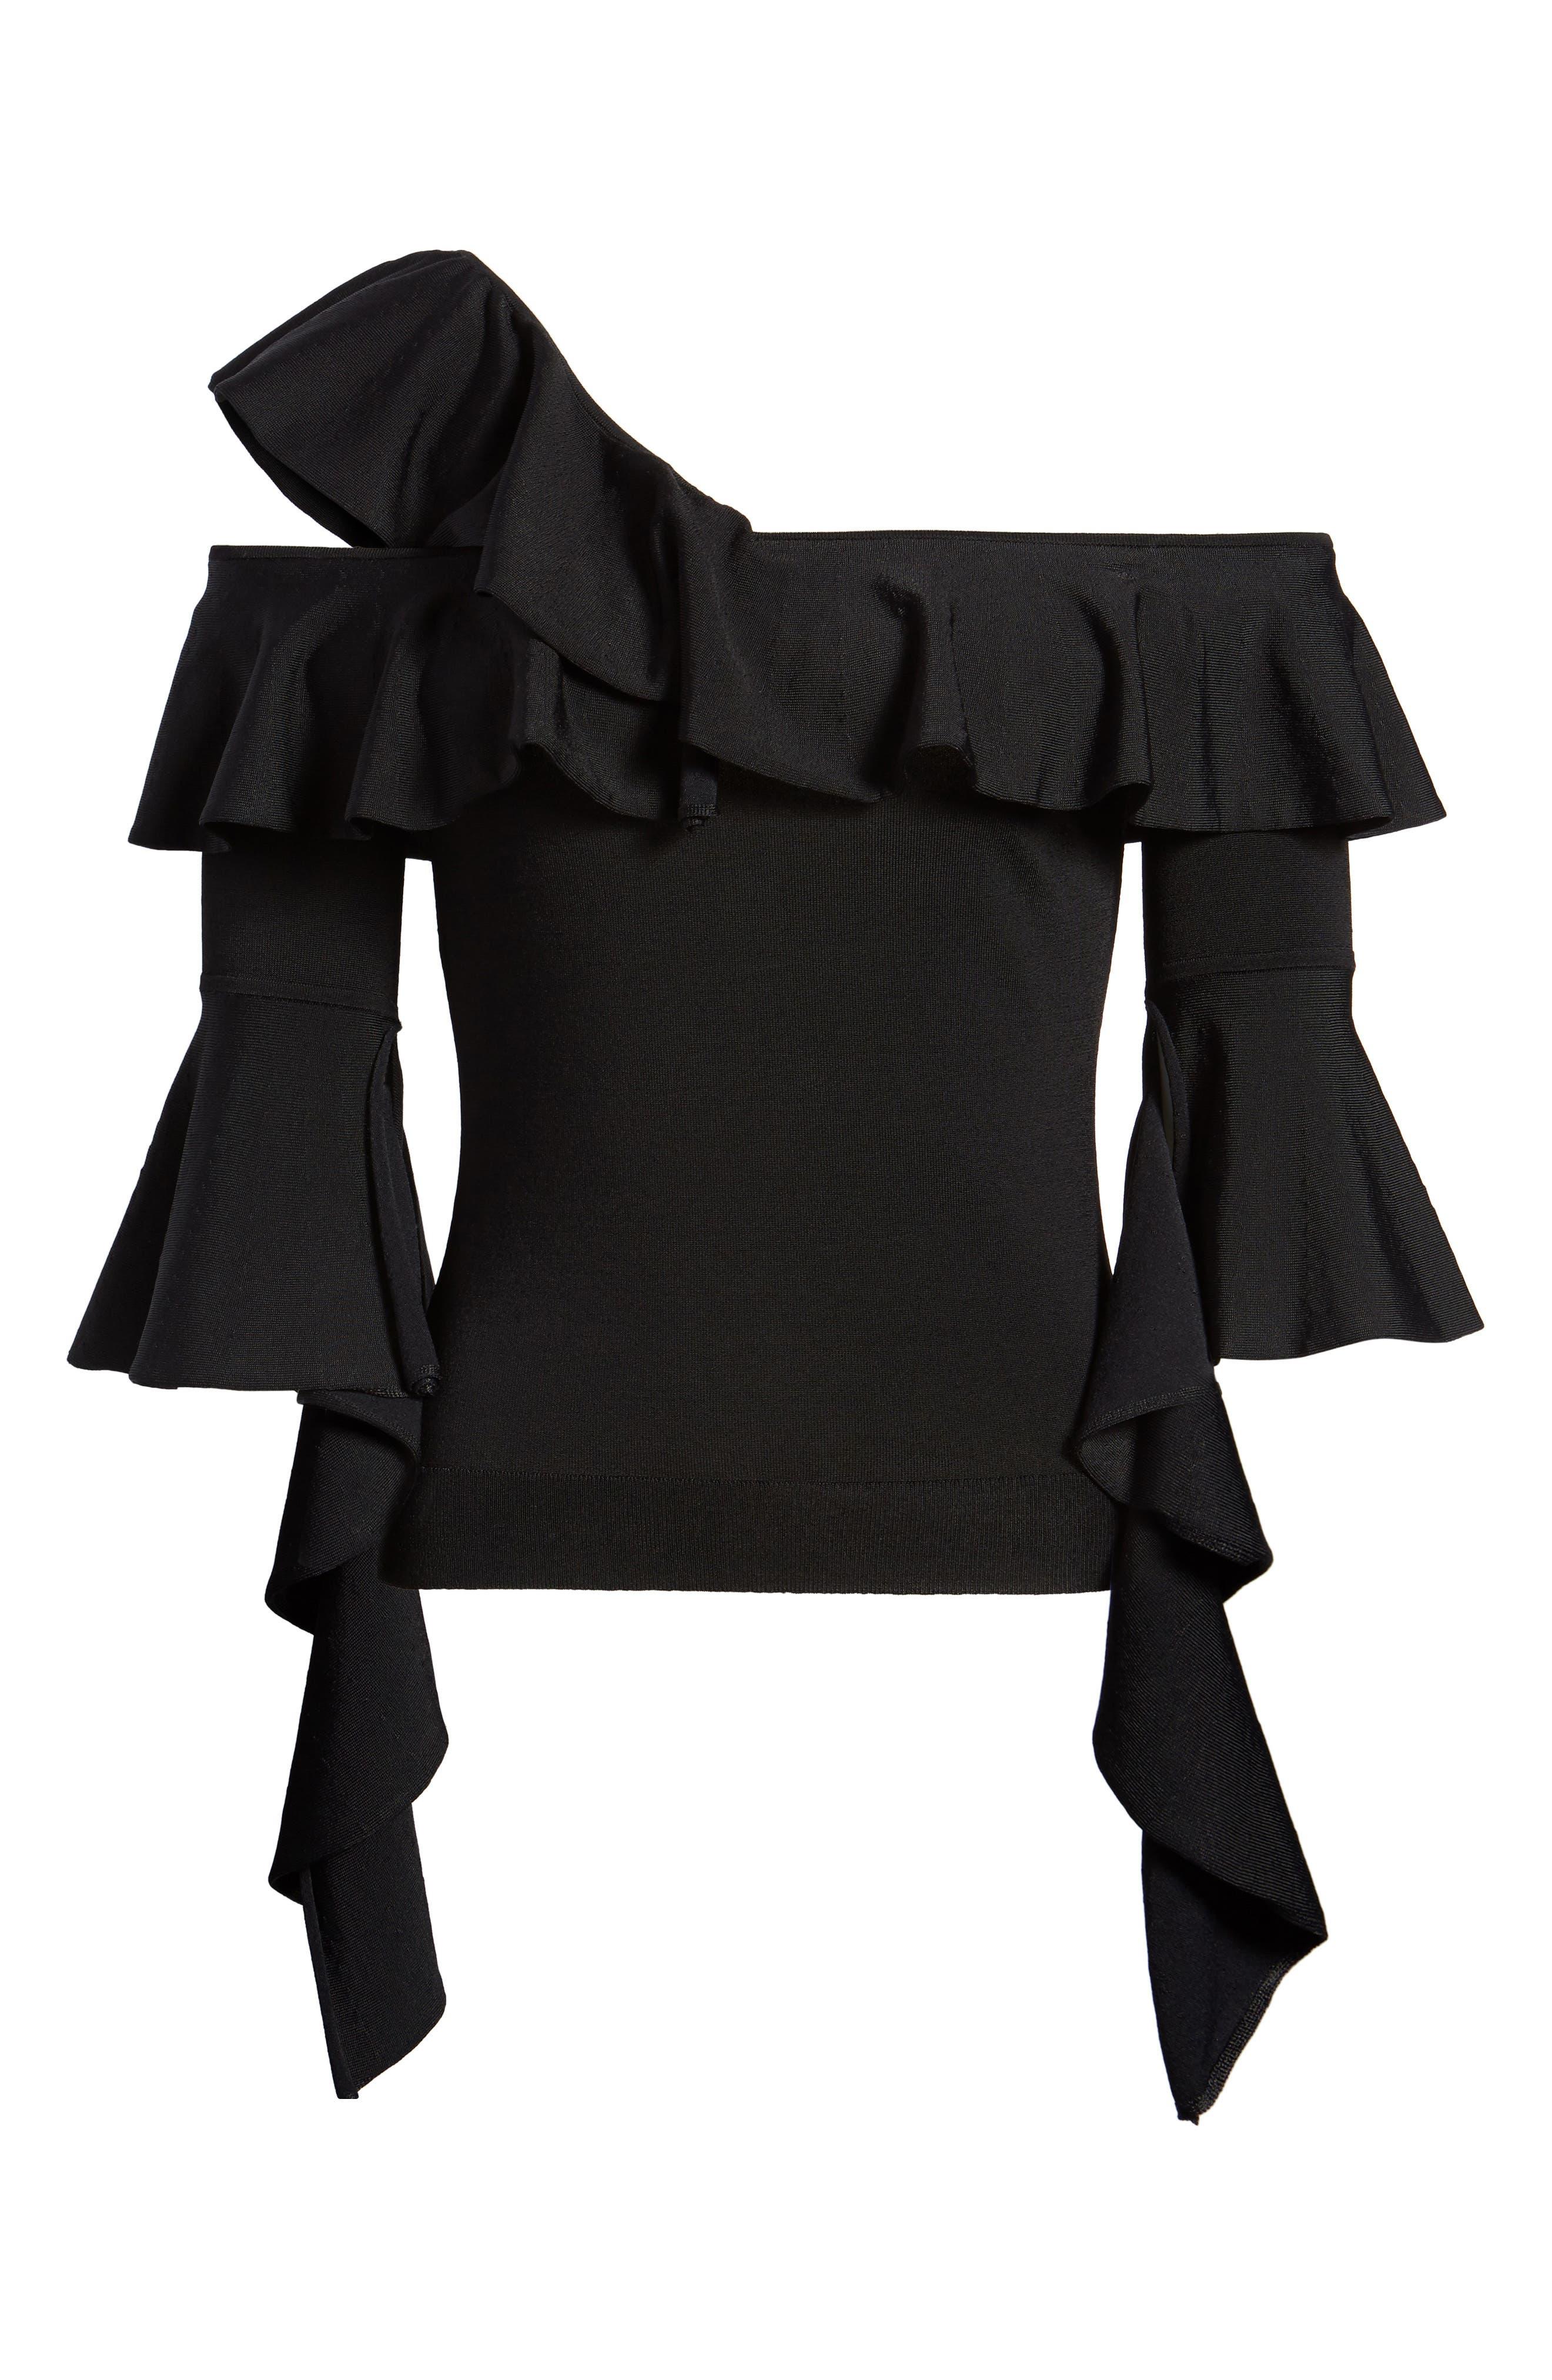 Cascading Ruffle One-Shoulder Top,                             Alternate thumbnail 6, color,                             Black